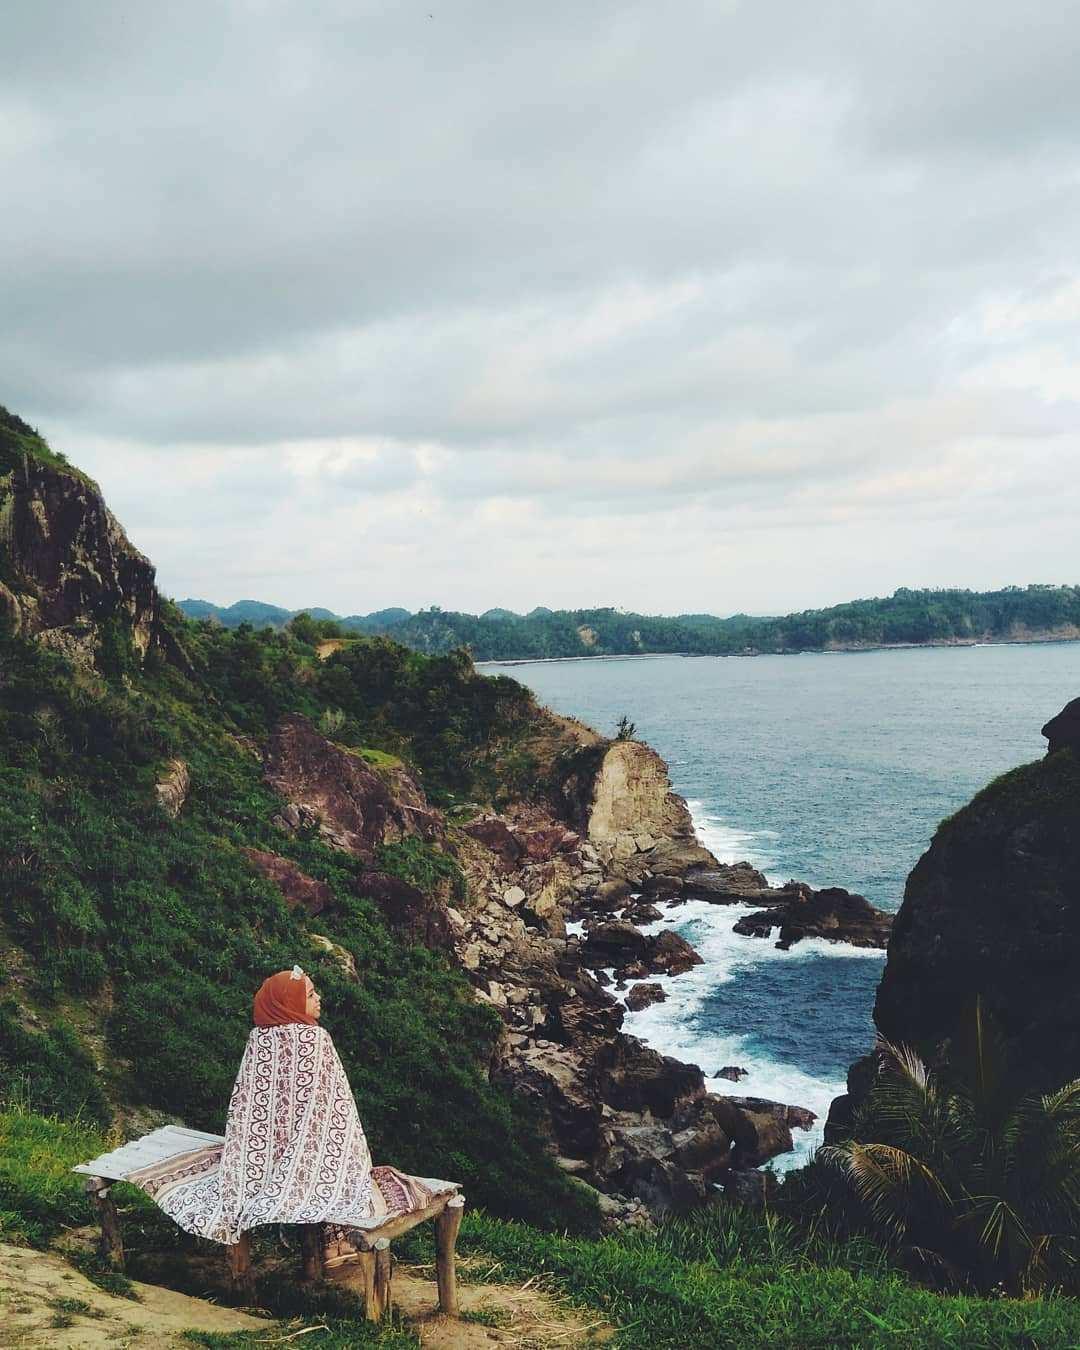 Pemandangan Pantai dari Bukit Pengilon Gunungkidul, Images From @ lulusoekardi